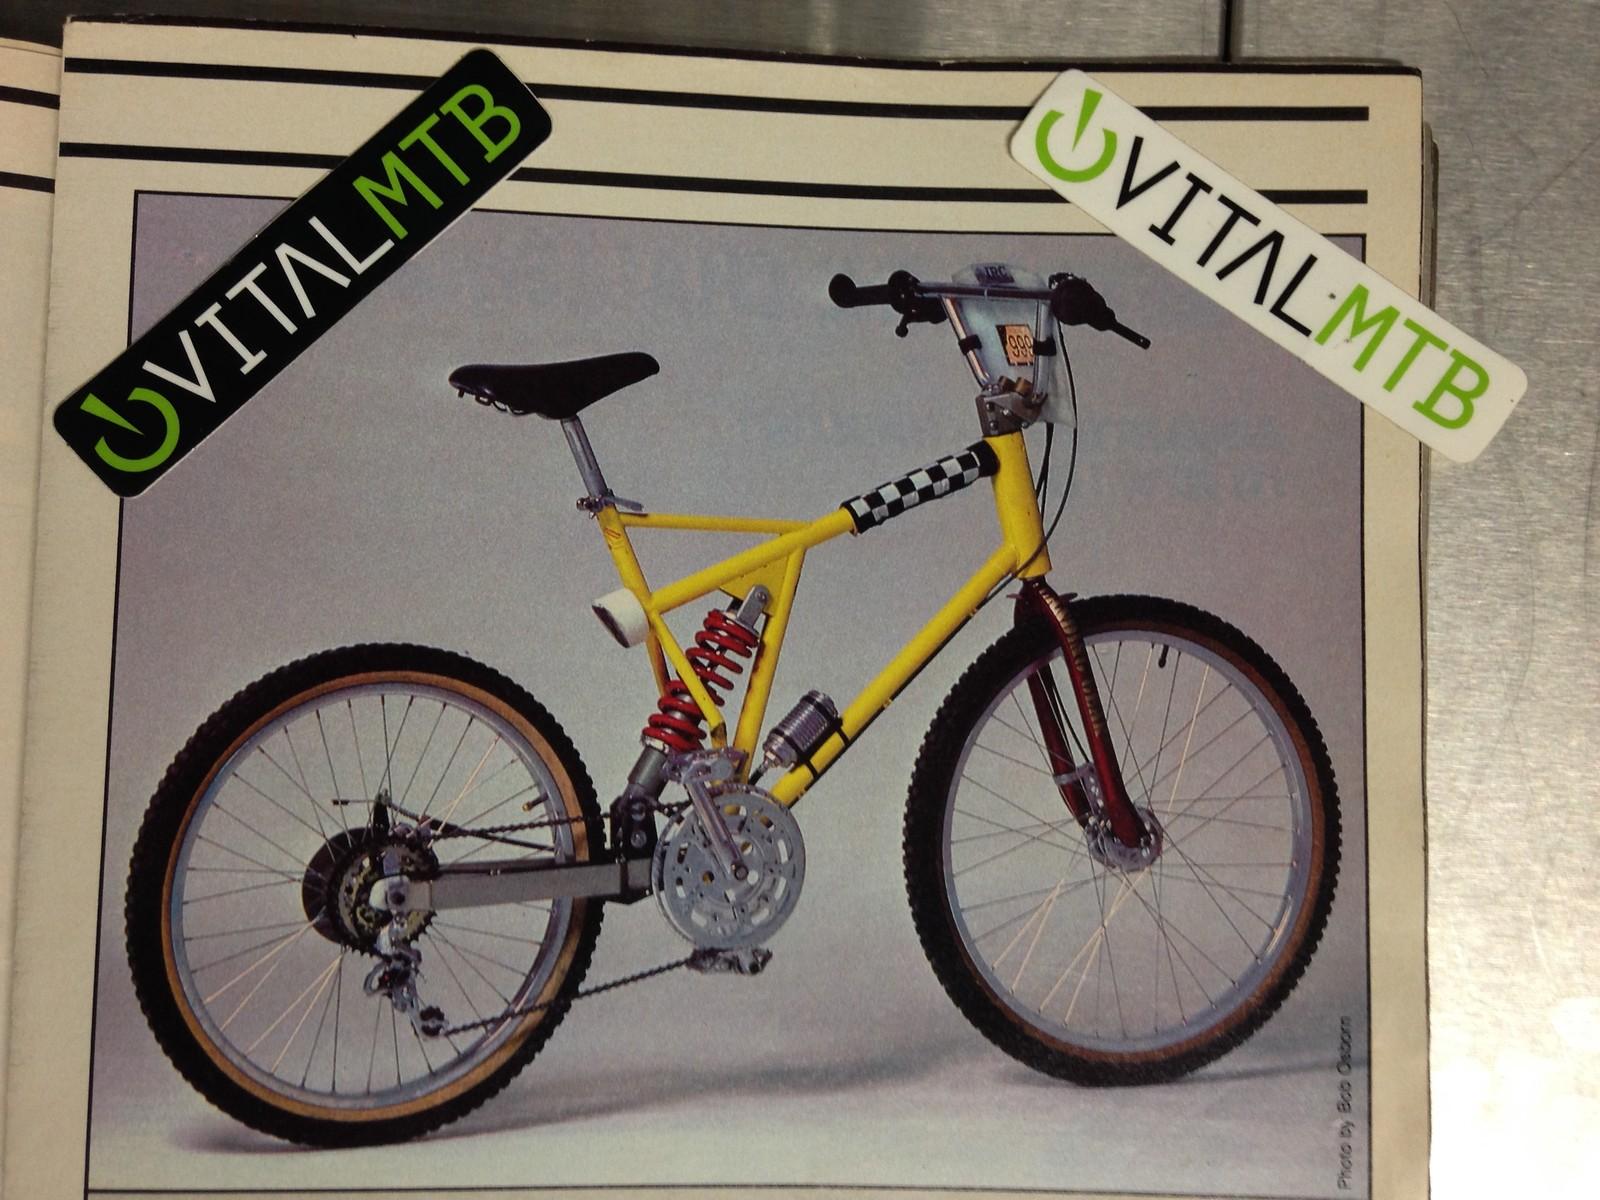 IMG 3643 - Scrub - Mountain Biking Pictures - Vital MTB